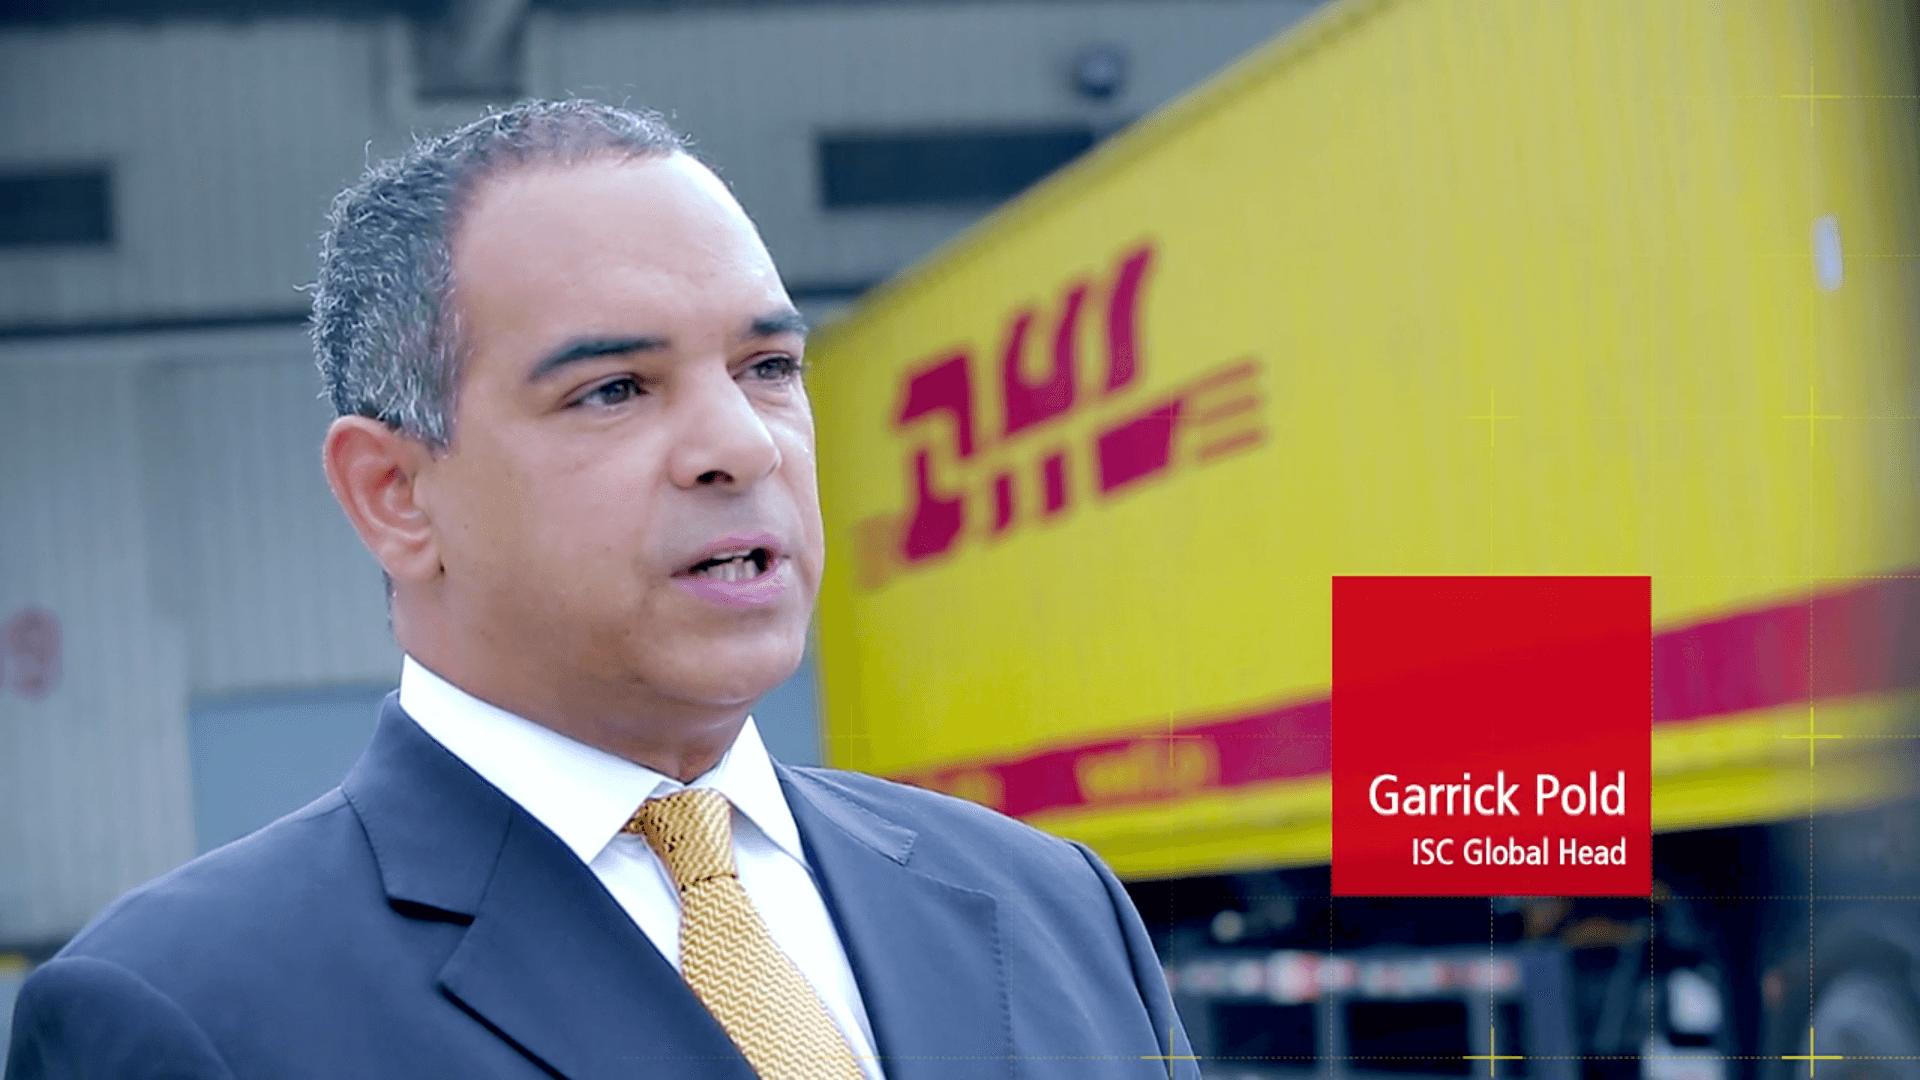 DHL International Supply Chain